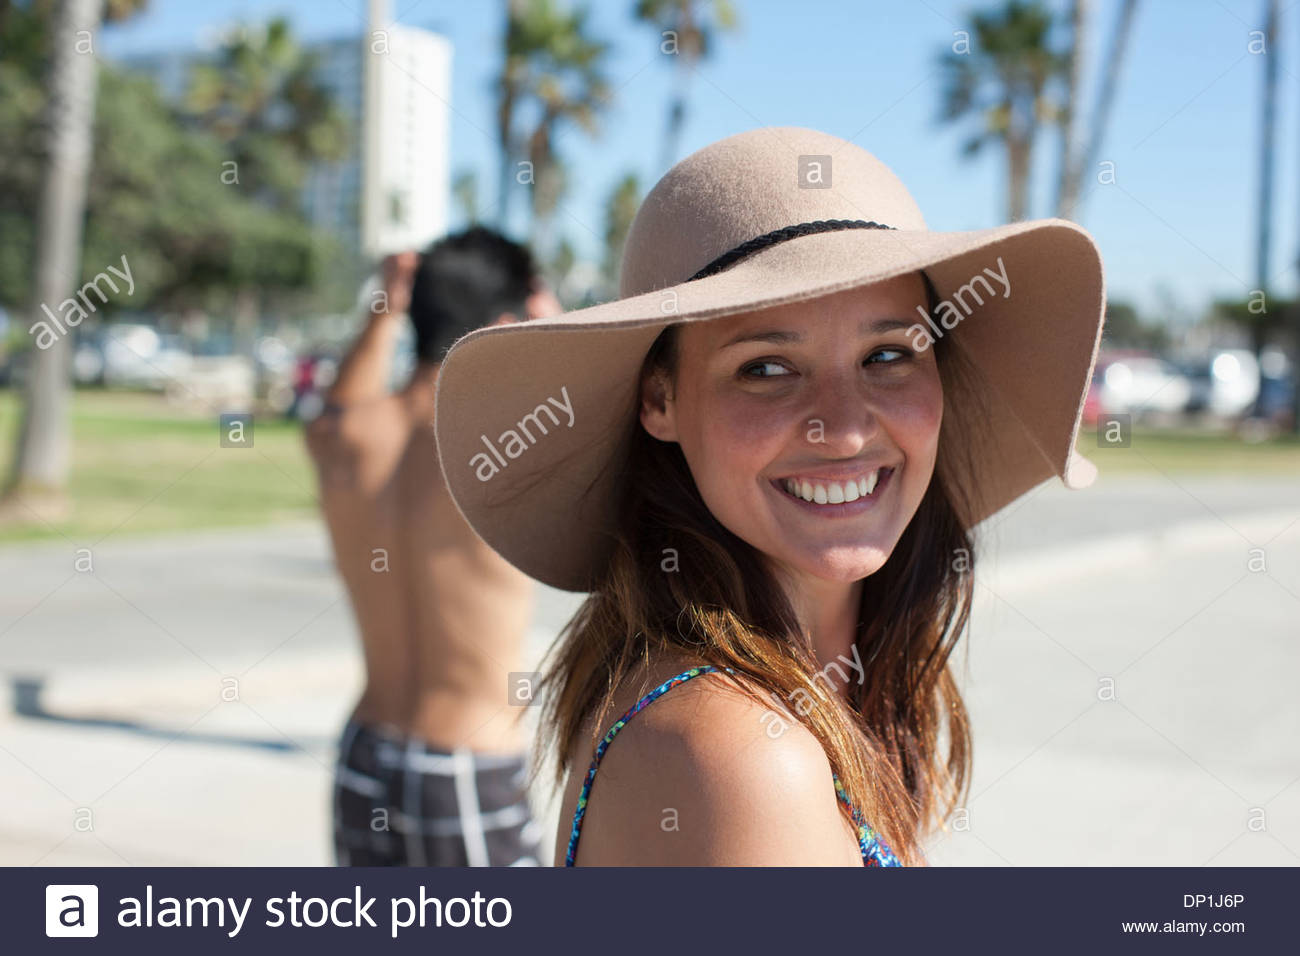 Woman wearing hat Photo Stock